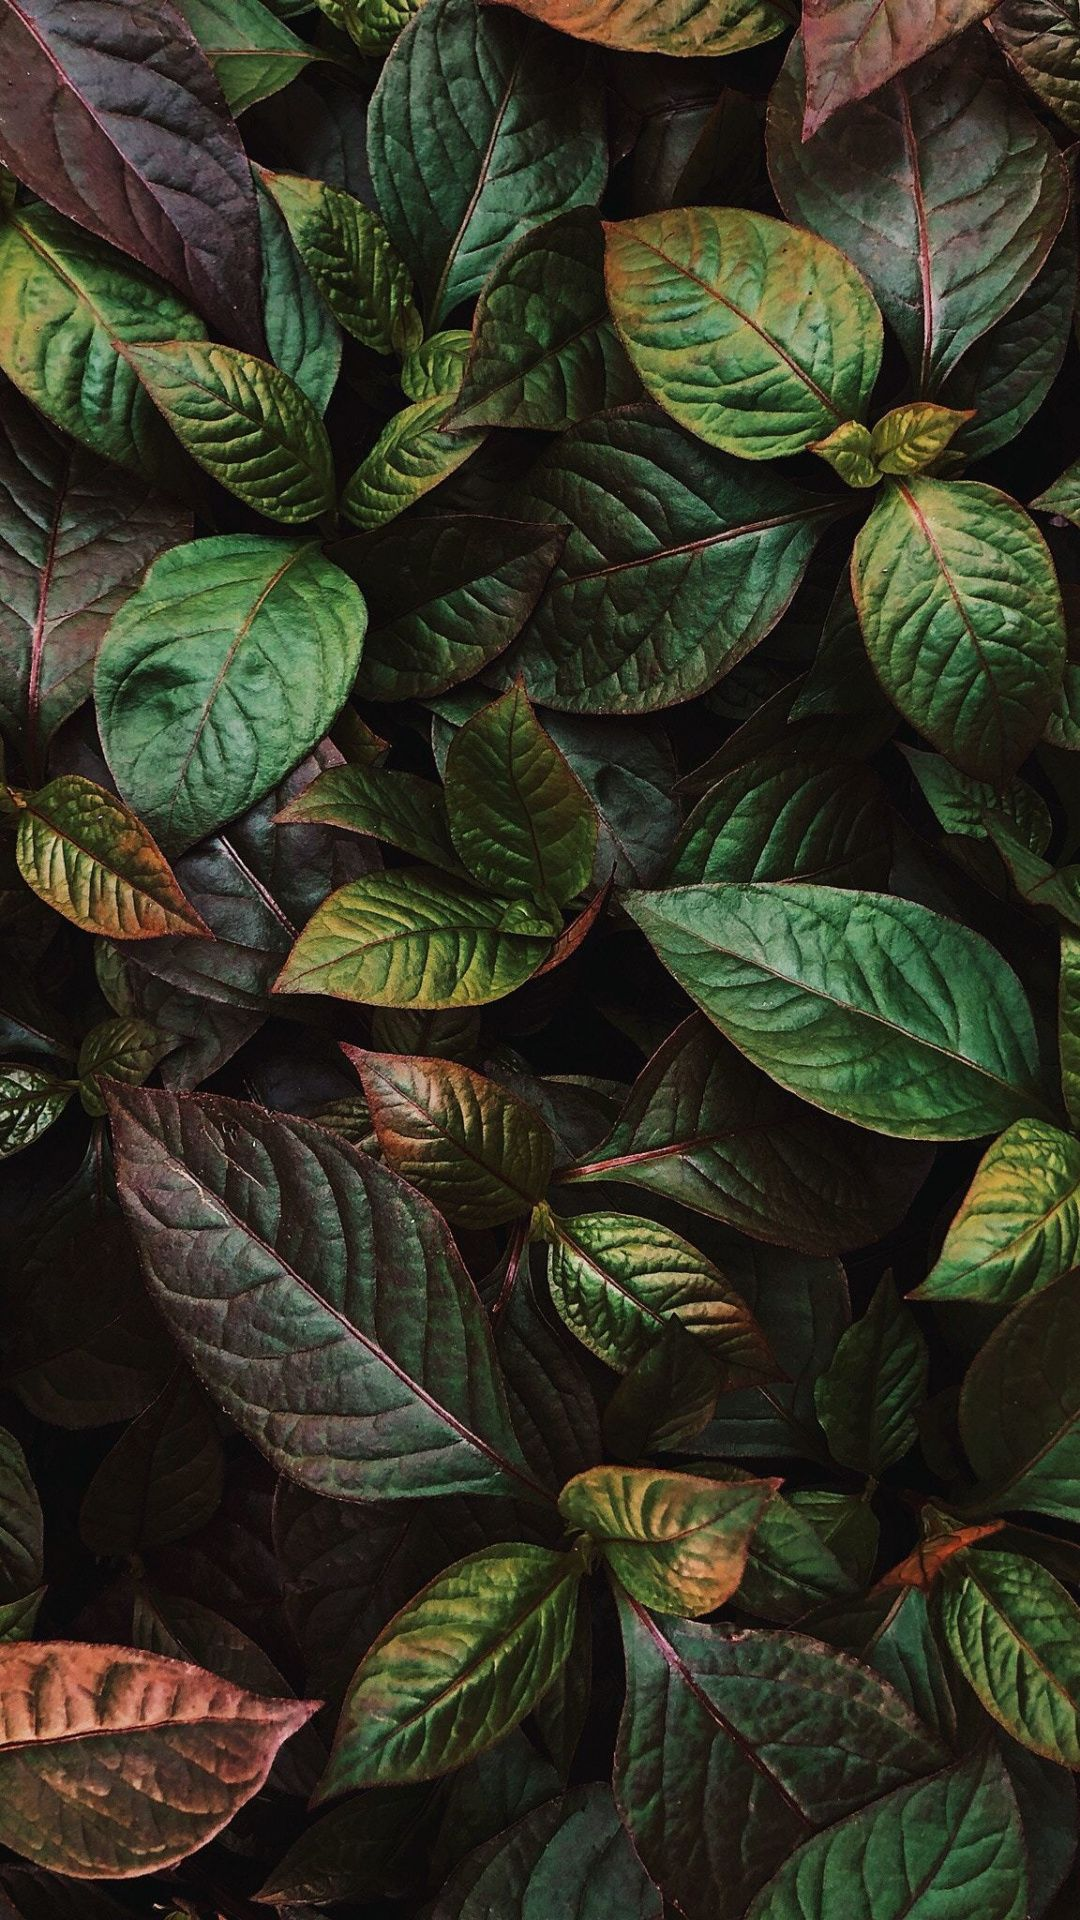 Green Leaves Plants Fresh Flora 1080x1920 Wallpaper Nature Wallpaper Plants Flower Wallpaper